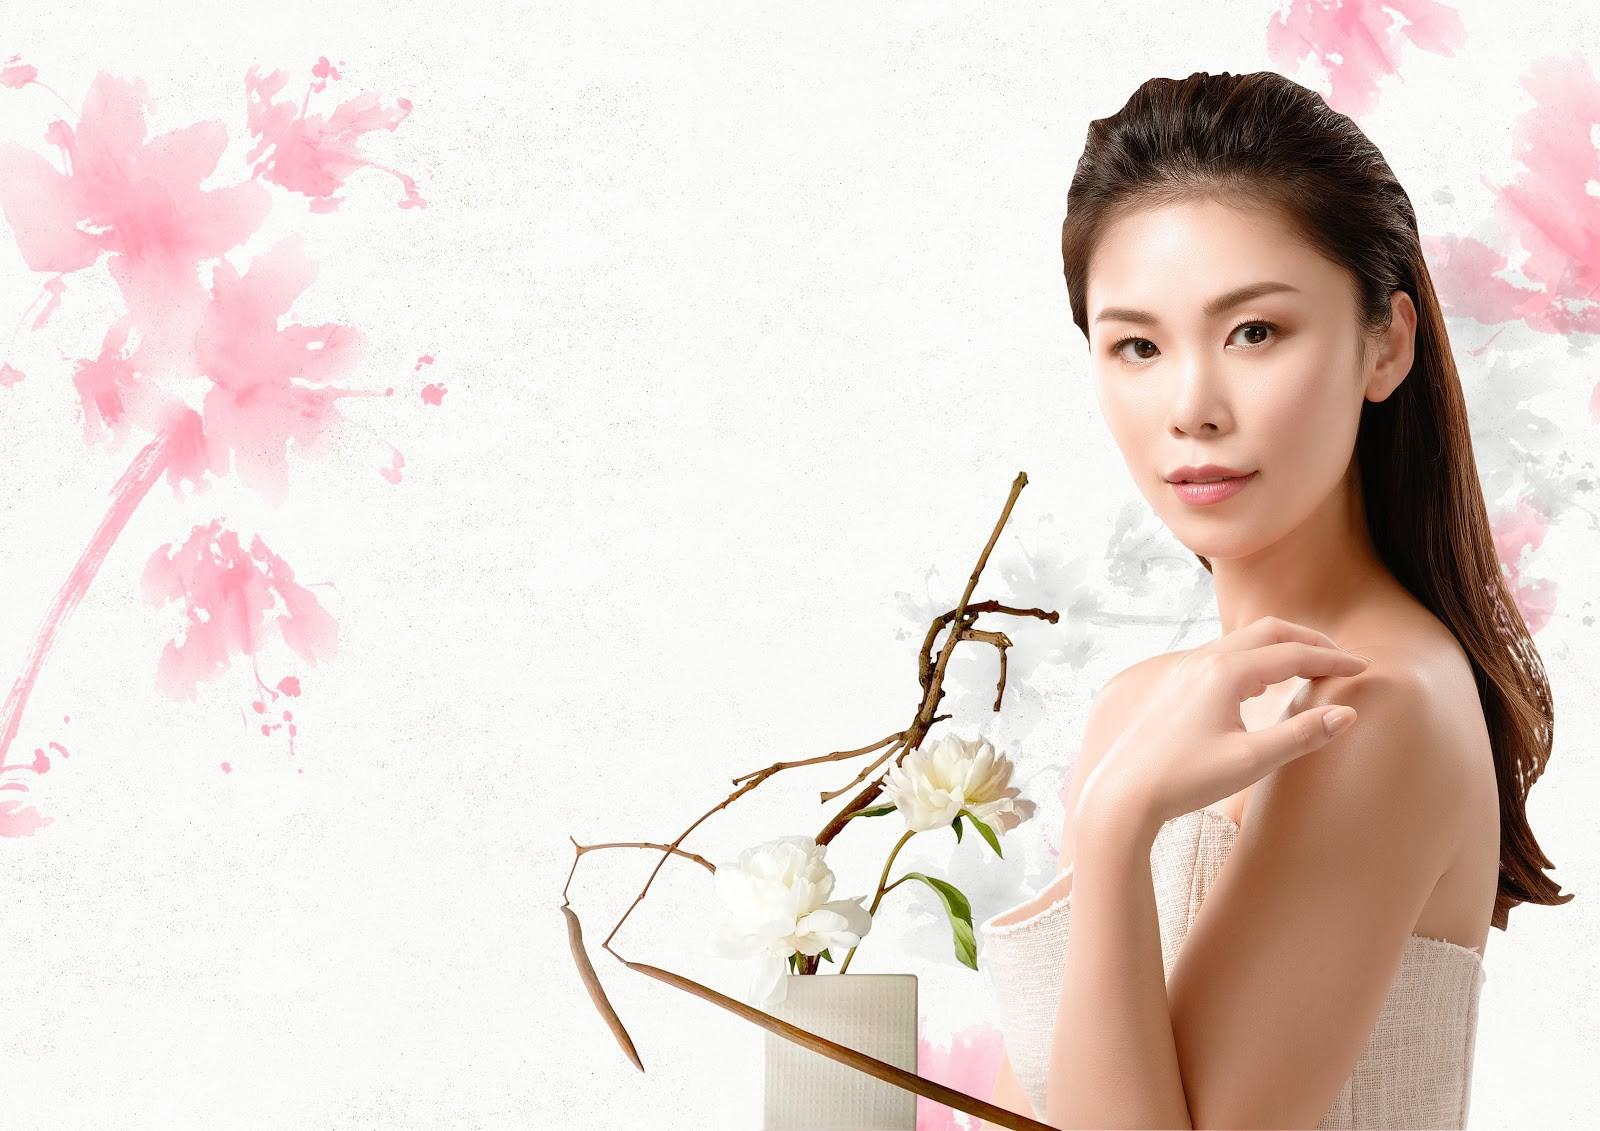 Vẻ đẹp Ikebana – nâng niu đóa hoa nhan sắc - Ảnh 2.